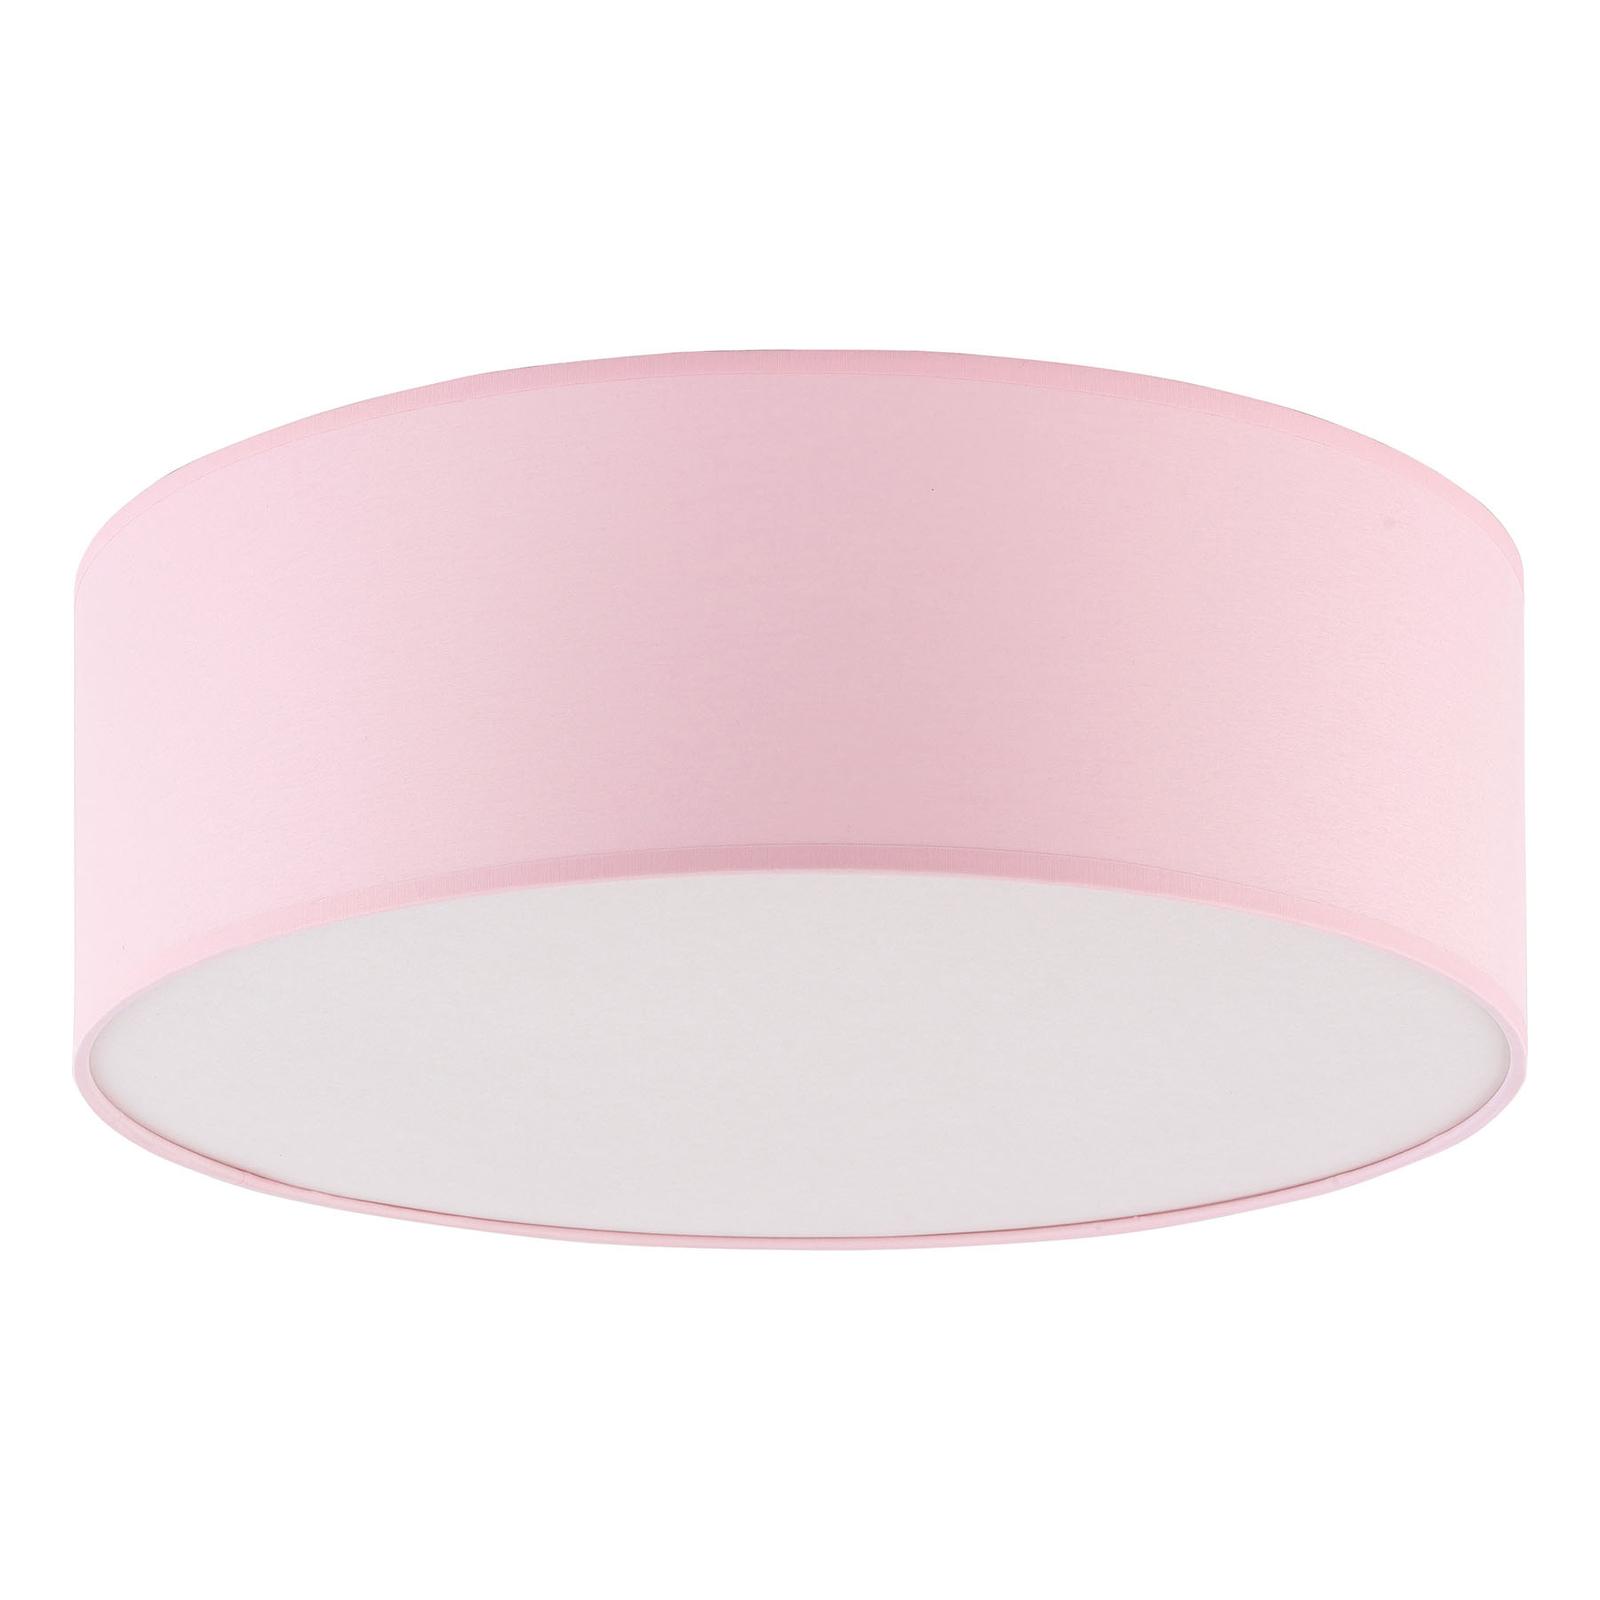 Taklampe Rondo Kids, Ø 38 cm, rosa